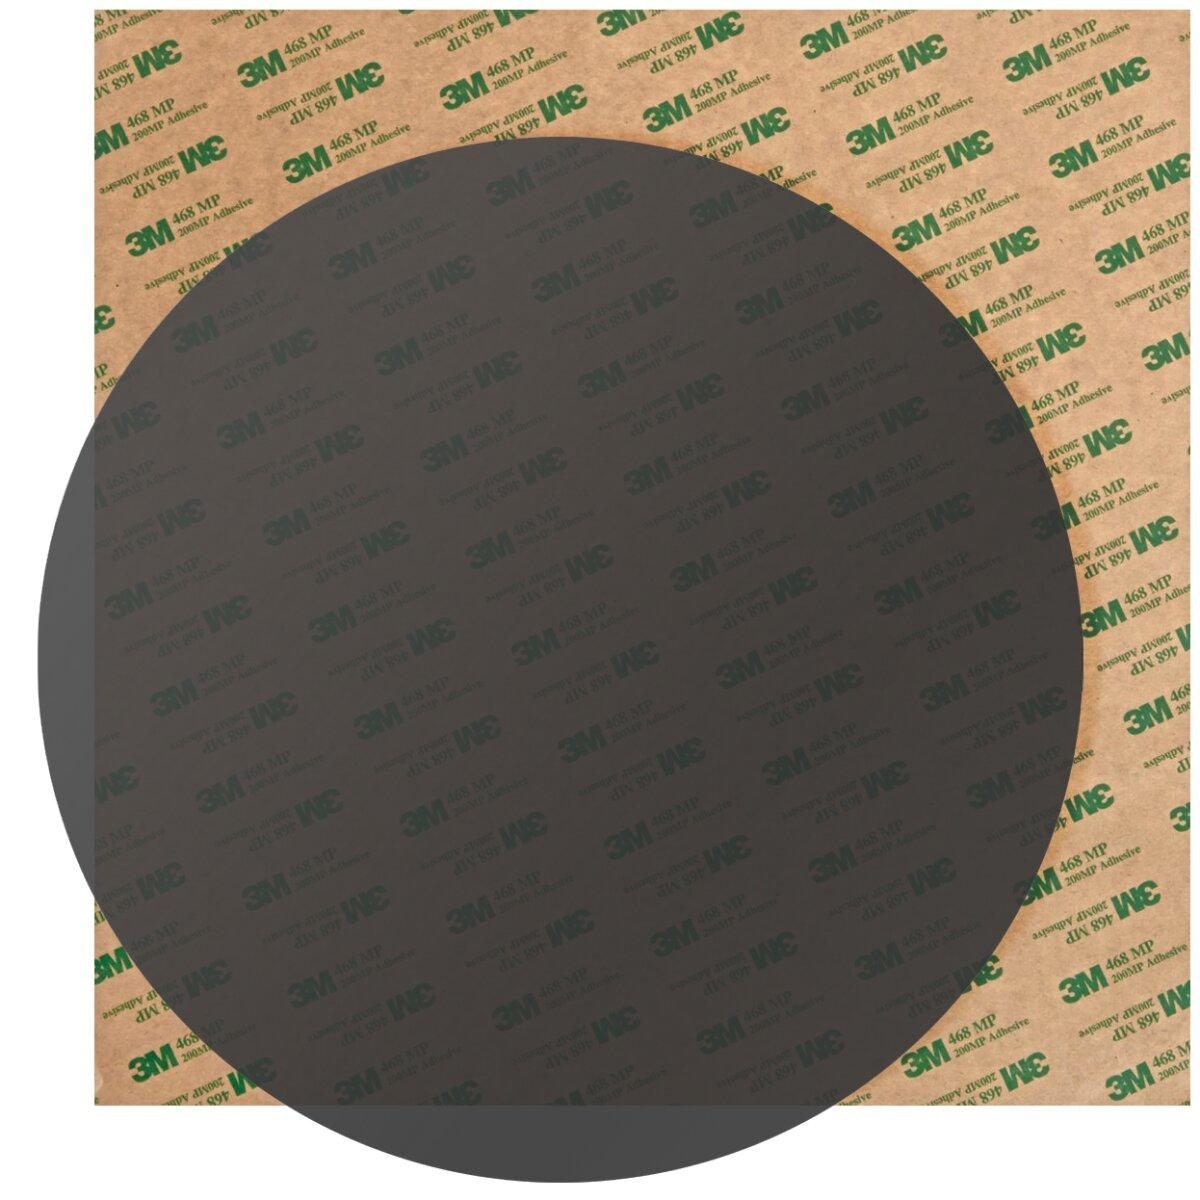 Minadax PEI 3D Druck Oberfläche Schwarz Rund 203mm inkl. 3M 468MP Transferfolie